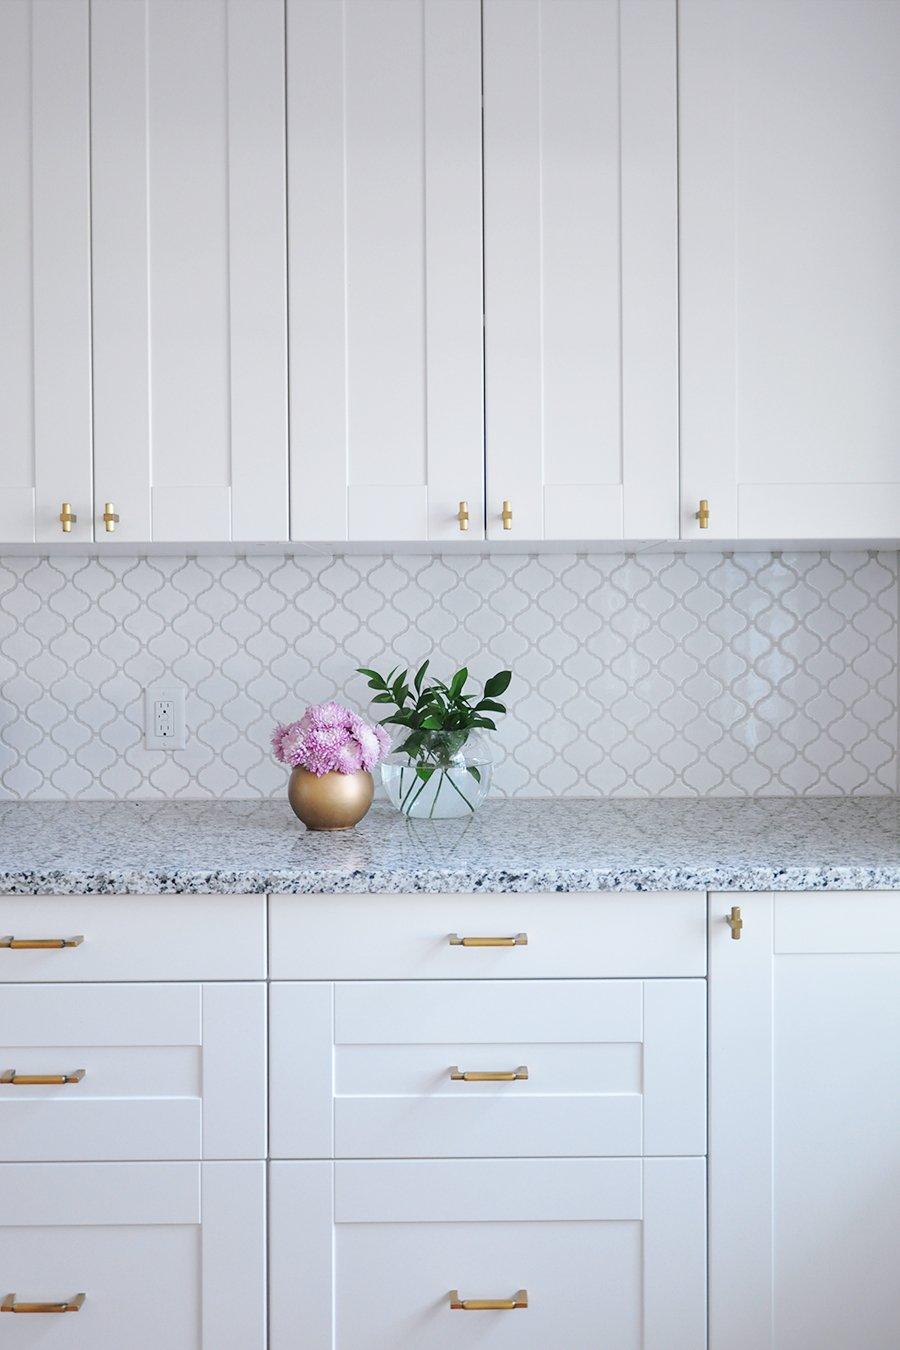 home-renovation-progress-report-kitchen-updates-9